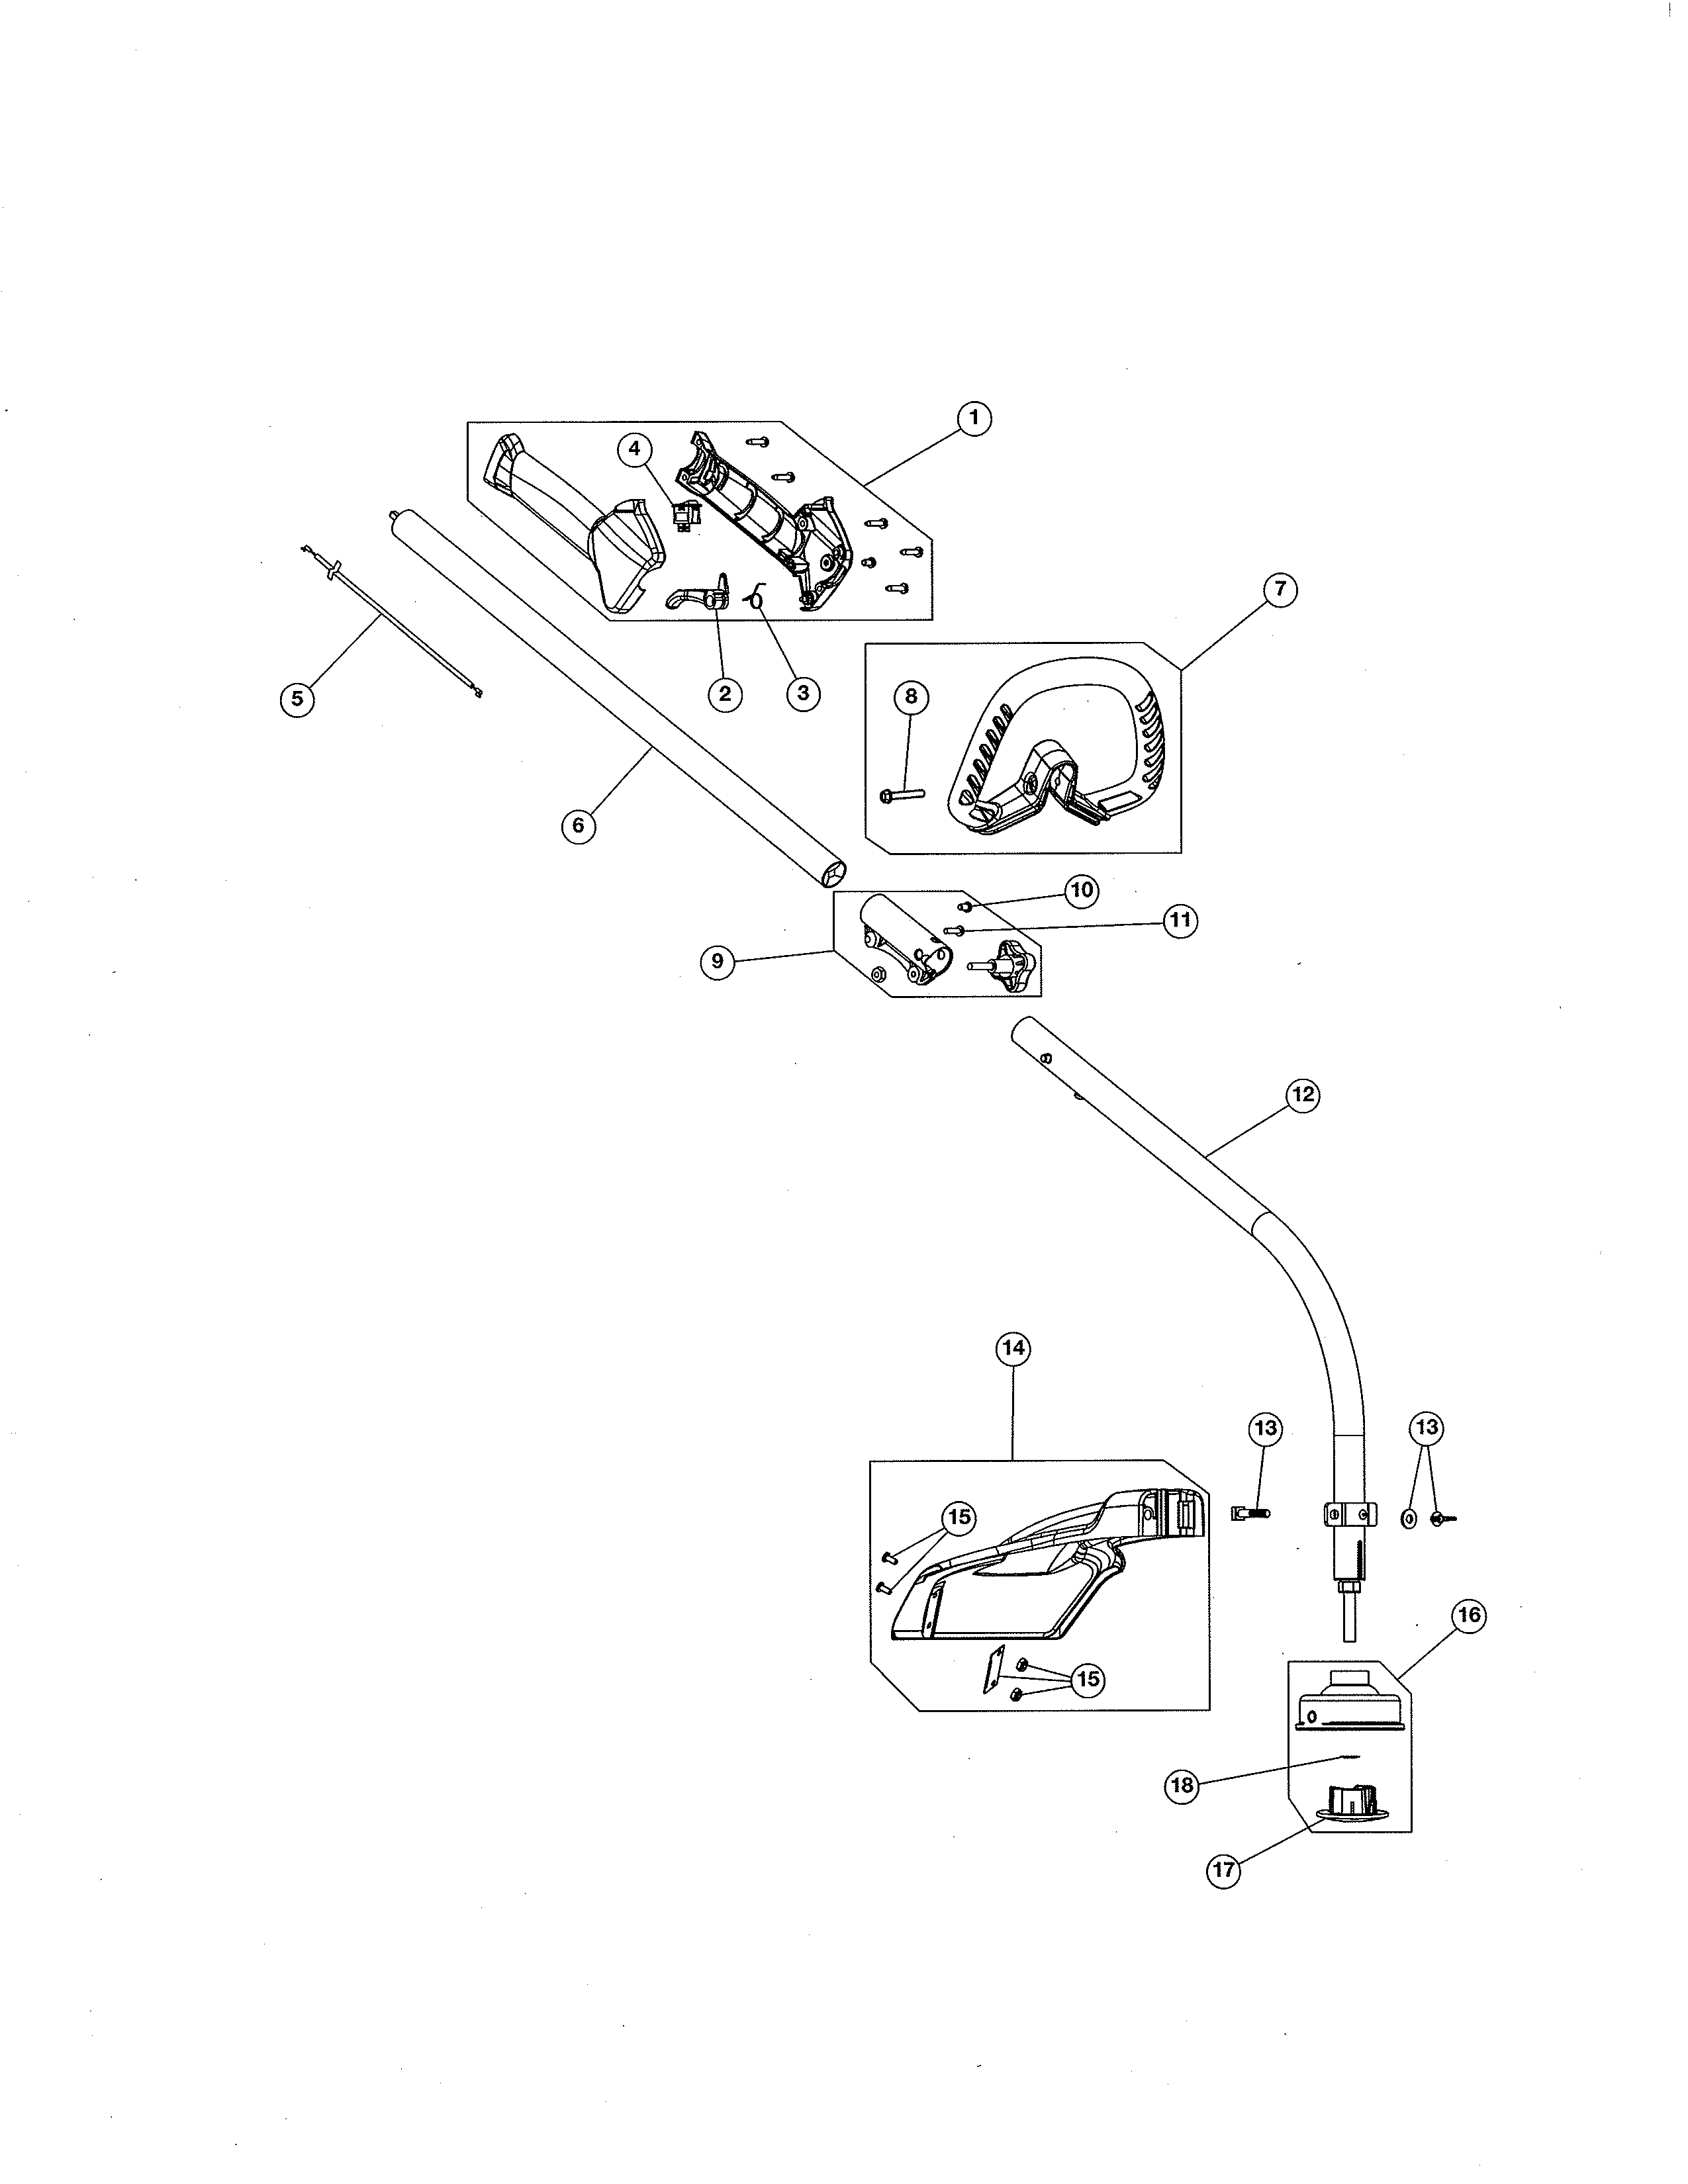 medium resolution of mtd gas trimmer model 41adz45c799 drive shaft handle shield parts diagram